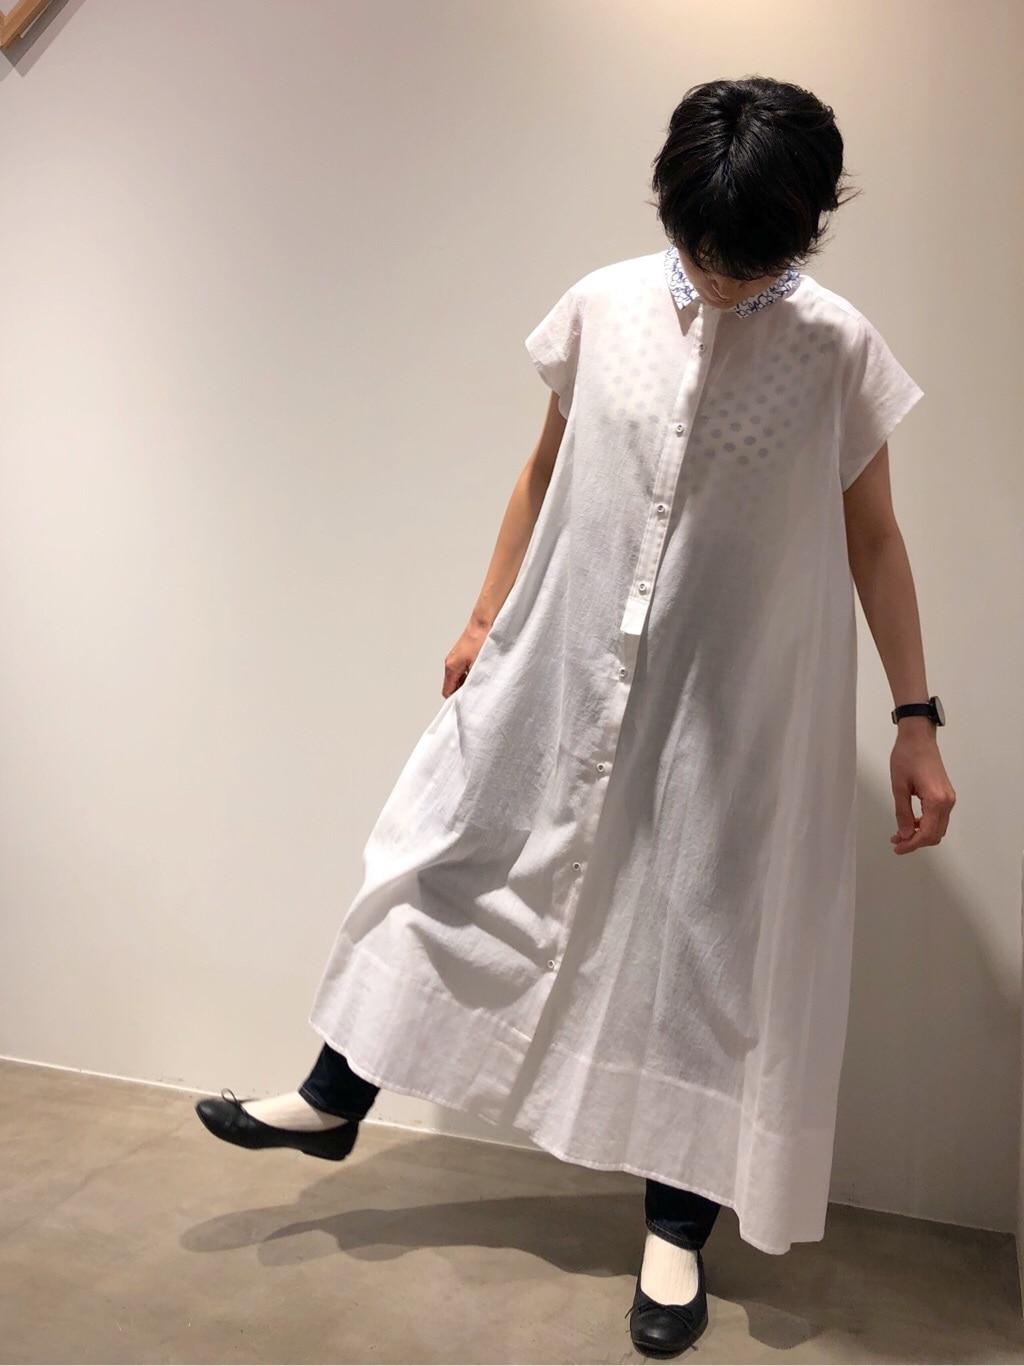 yuni / bulle de savon 京都路面 身長:158cm 2020.05.06